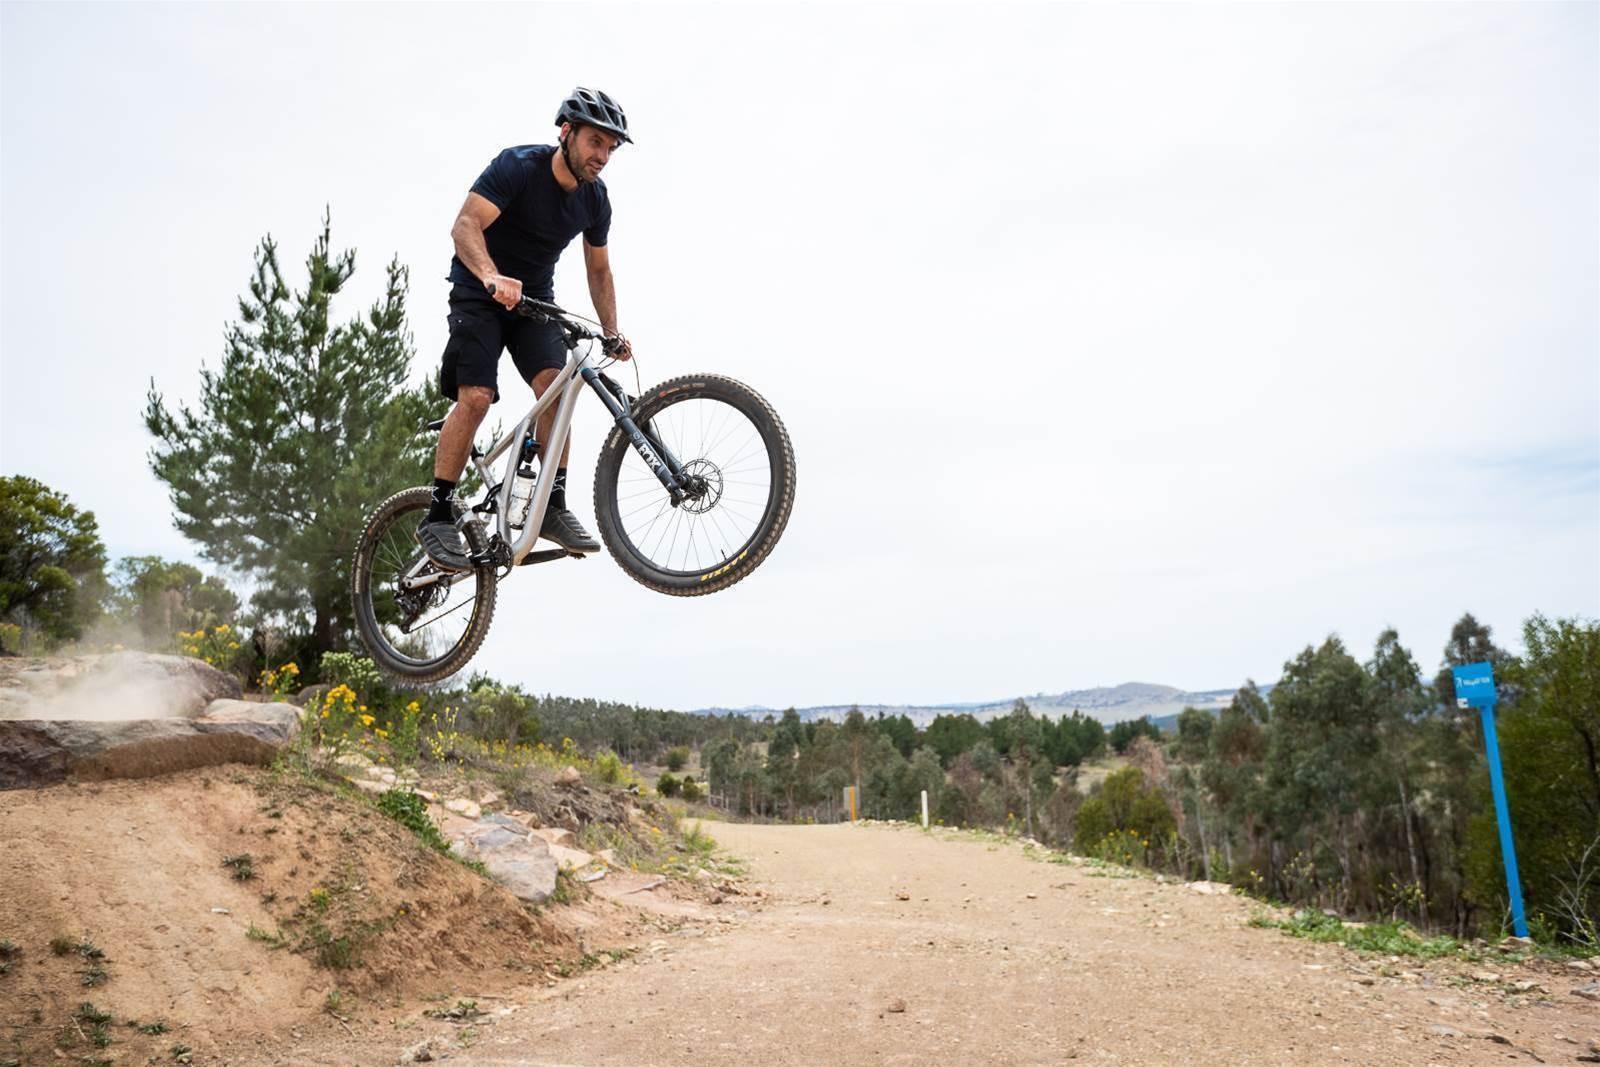 Skills: Road Gaps and Step Downs